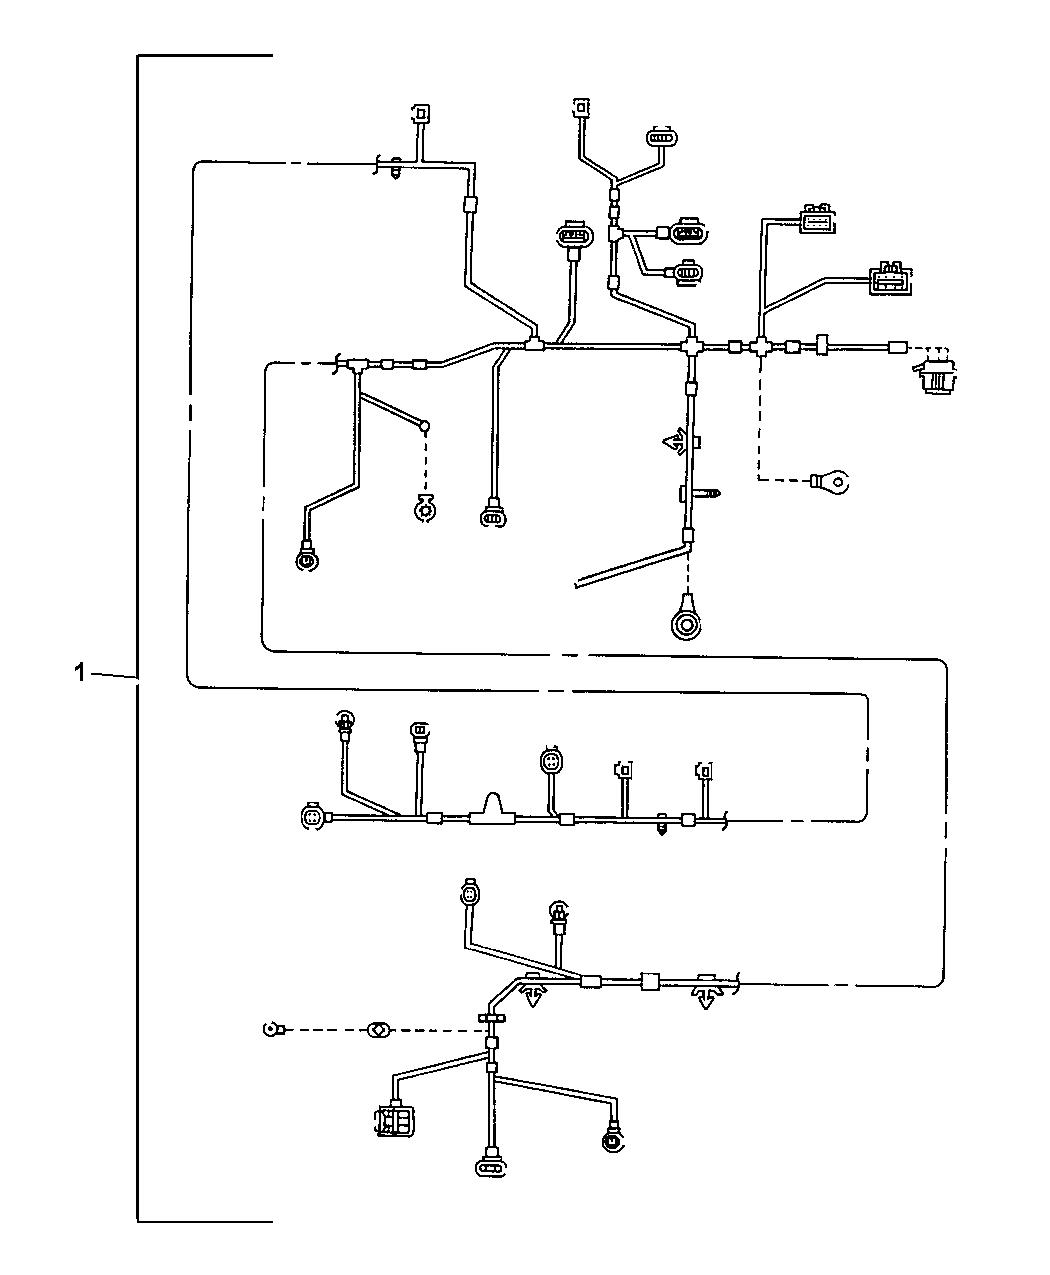 1998 dodge stratus wiring diagram 1998 dodge stratus wiring engine   related mopar parts giant  1998 dodge stratus wiring engine